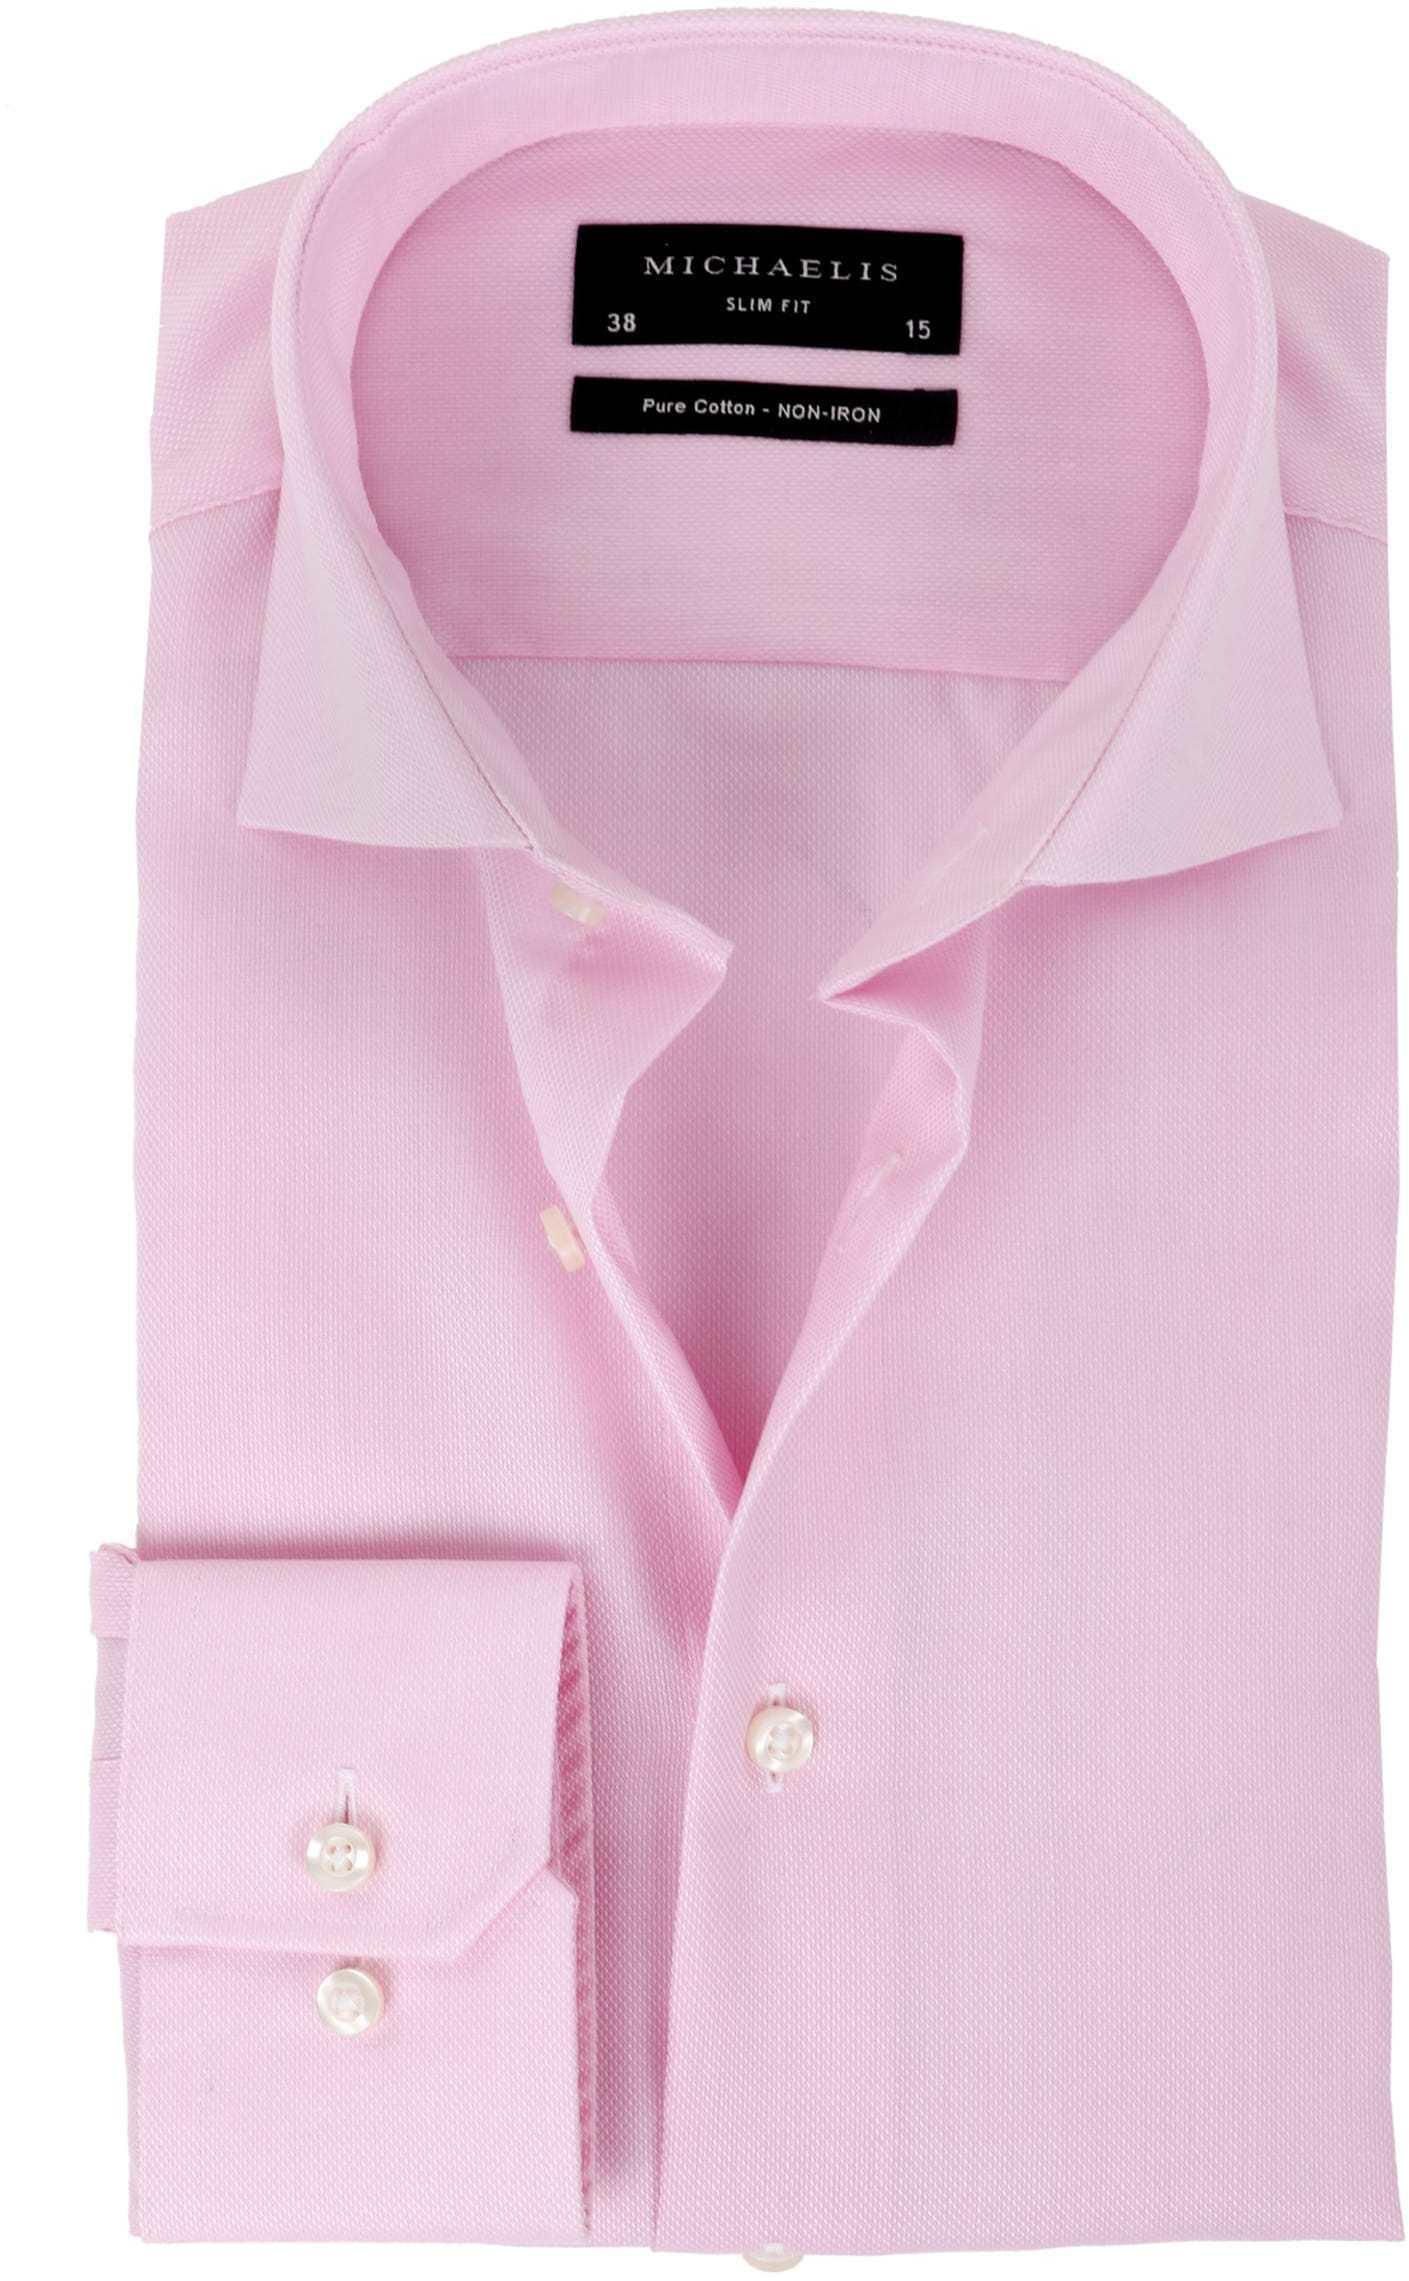 Michaelis Overhemd SlimFit Roze foto 0